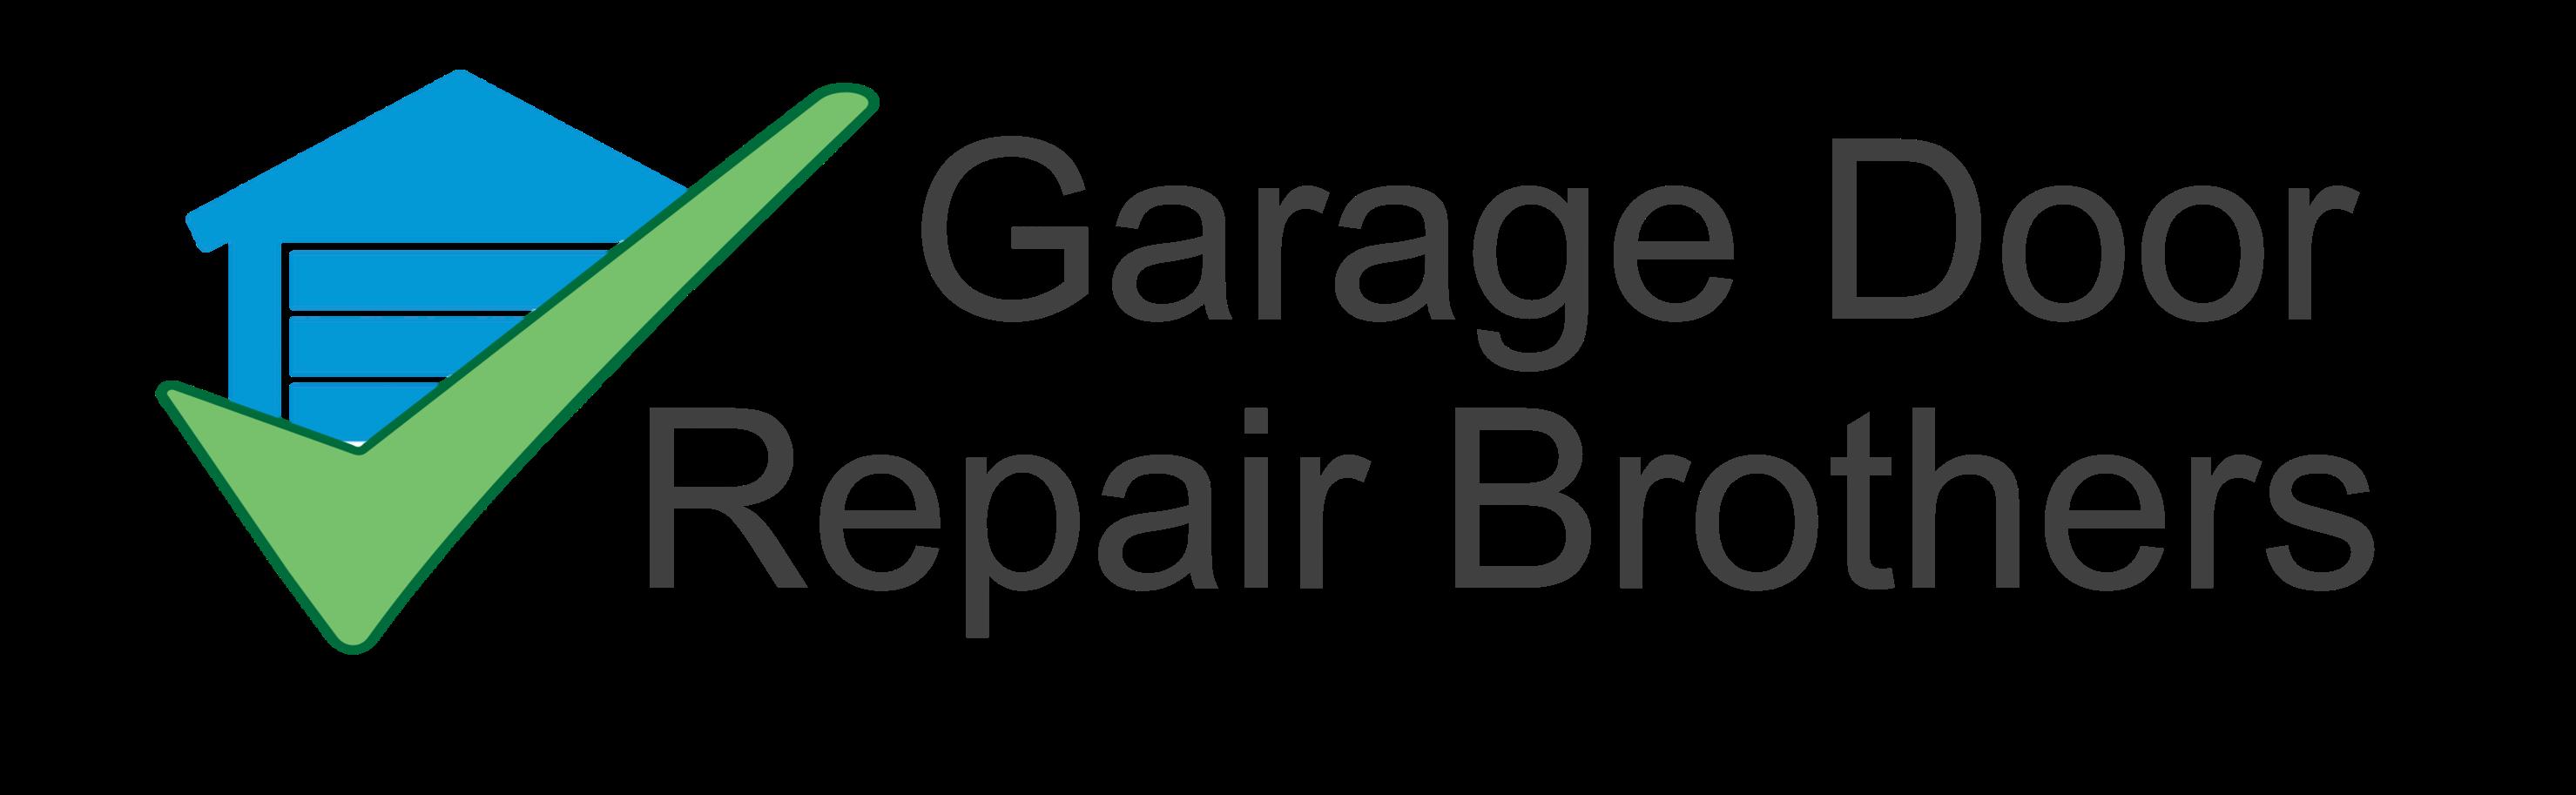 Garage Door Repair Longmont Free Estimates Residential